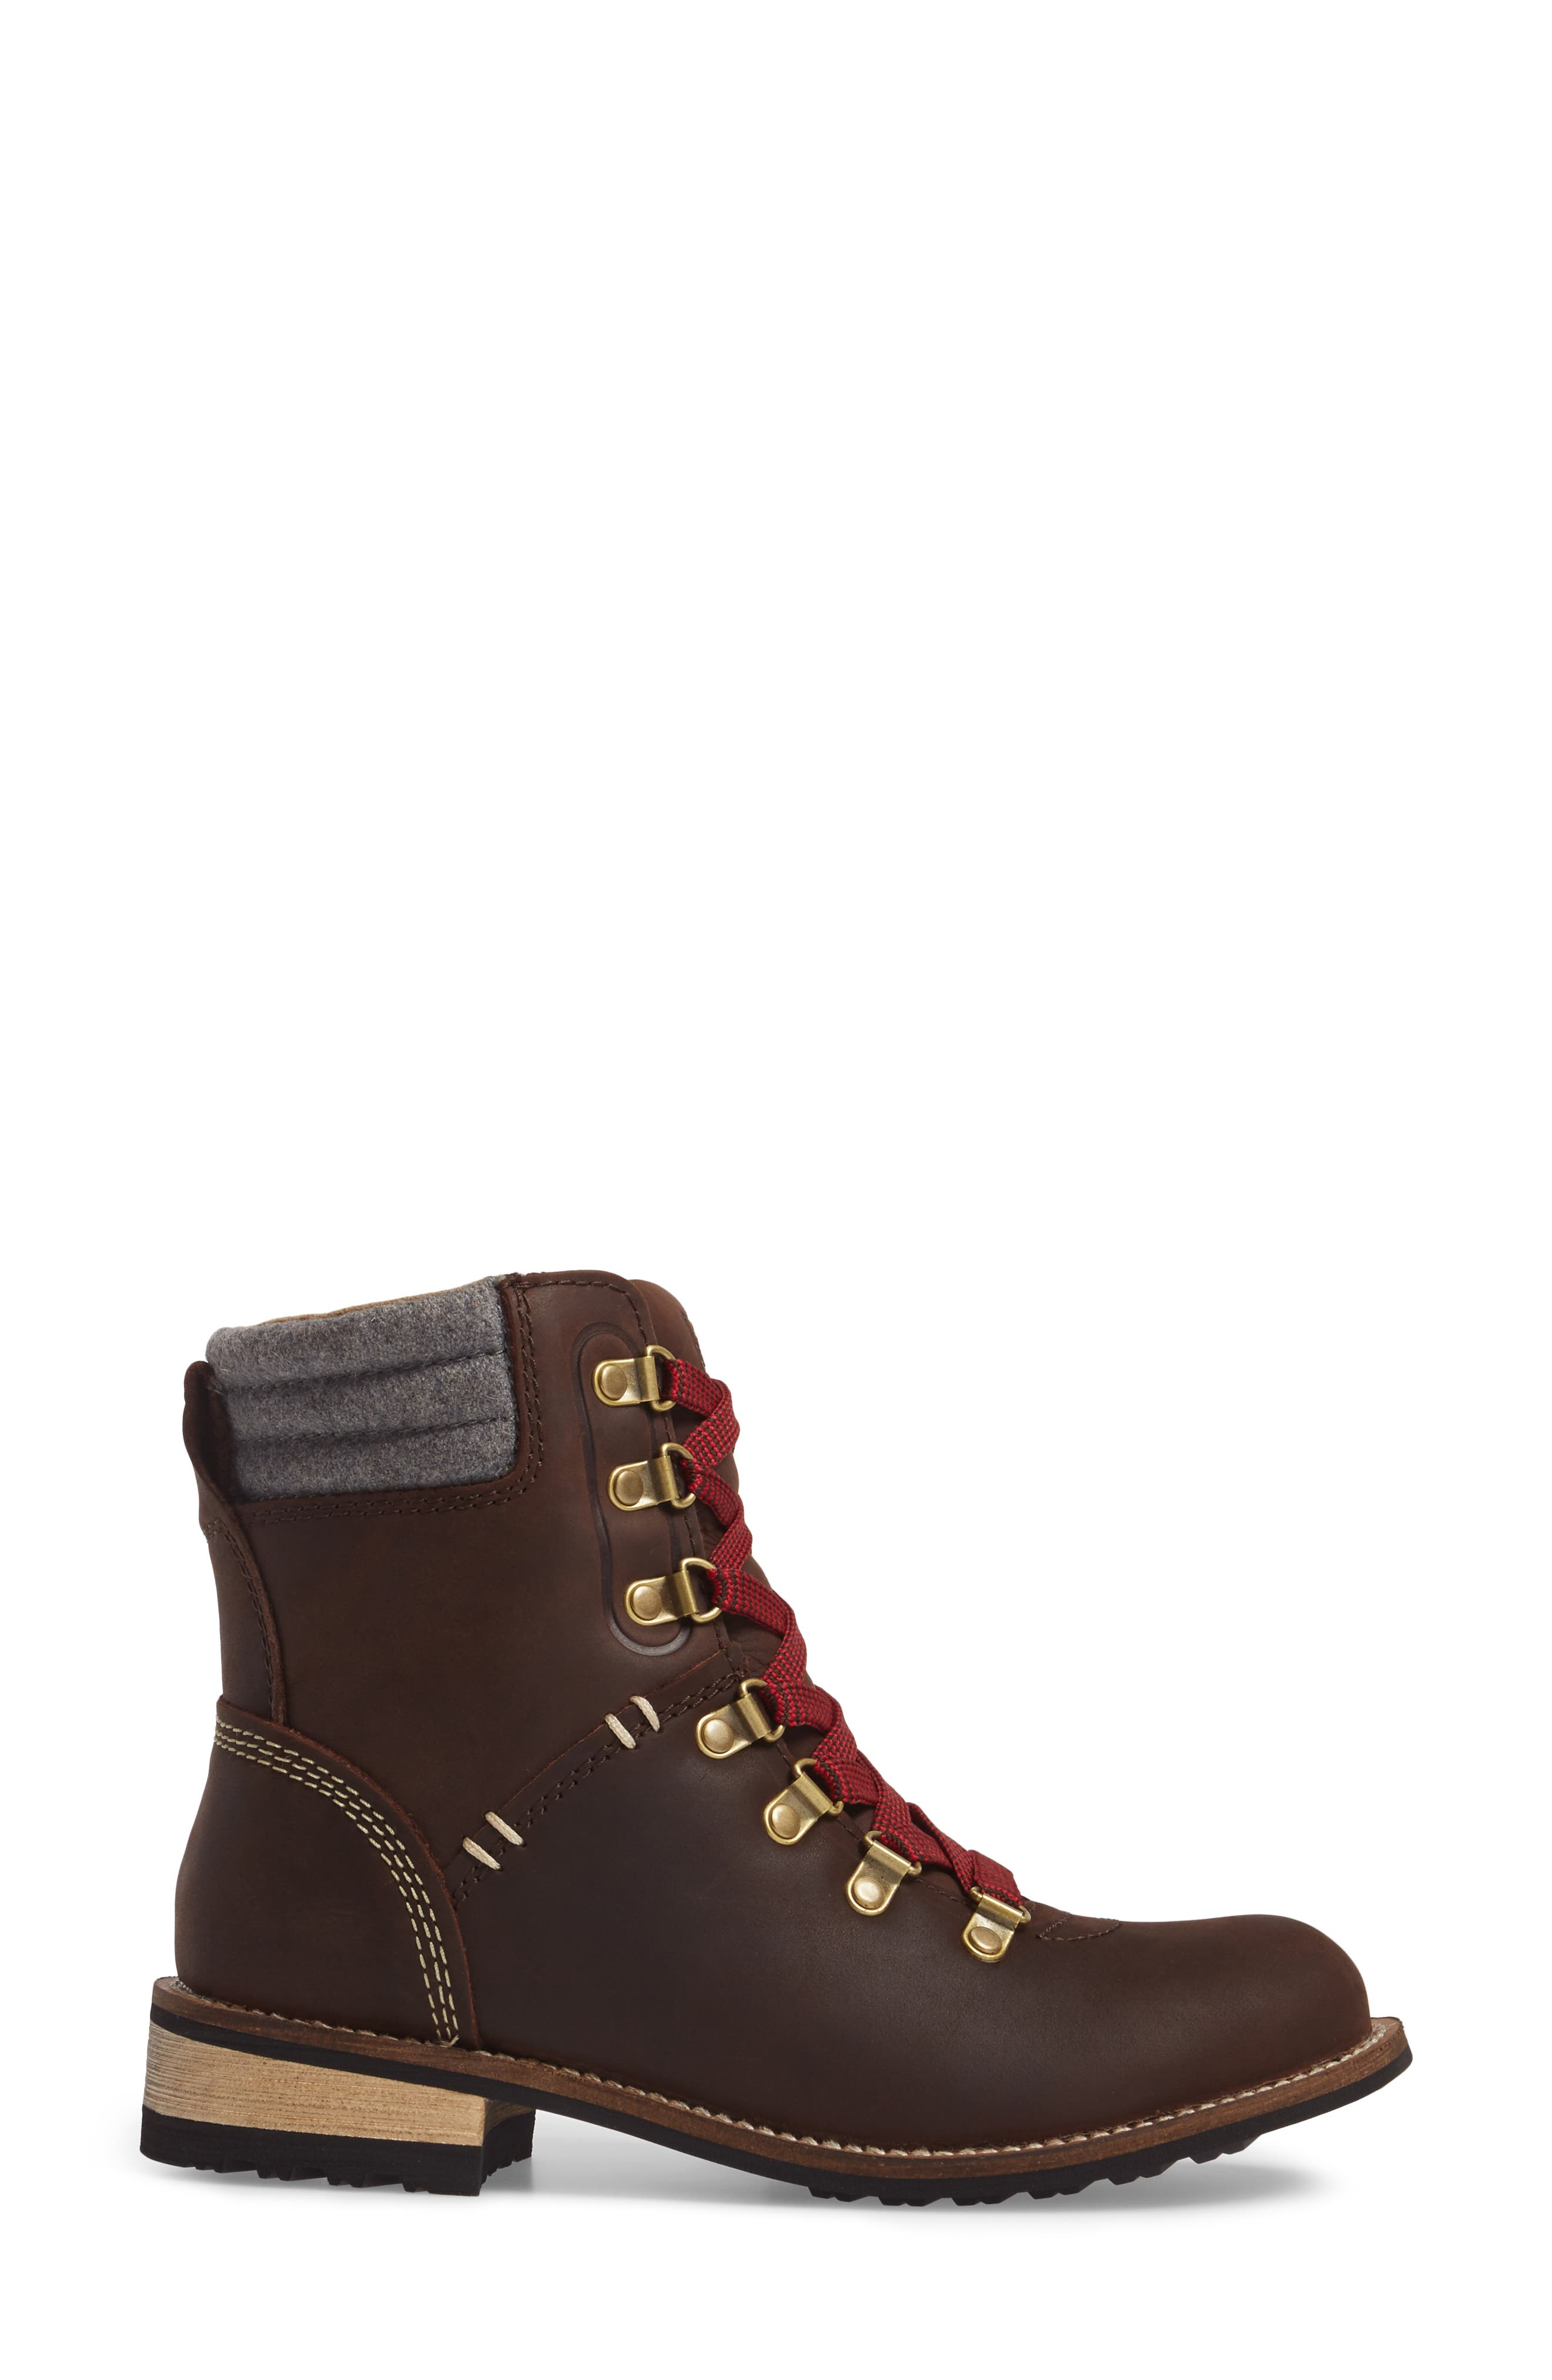 Surrey II Waterproof Boot,                             Alternate thumbnail 3, color,                             Brown Leather